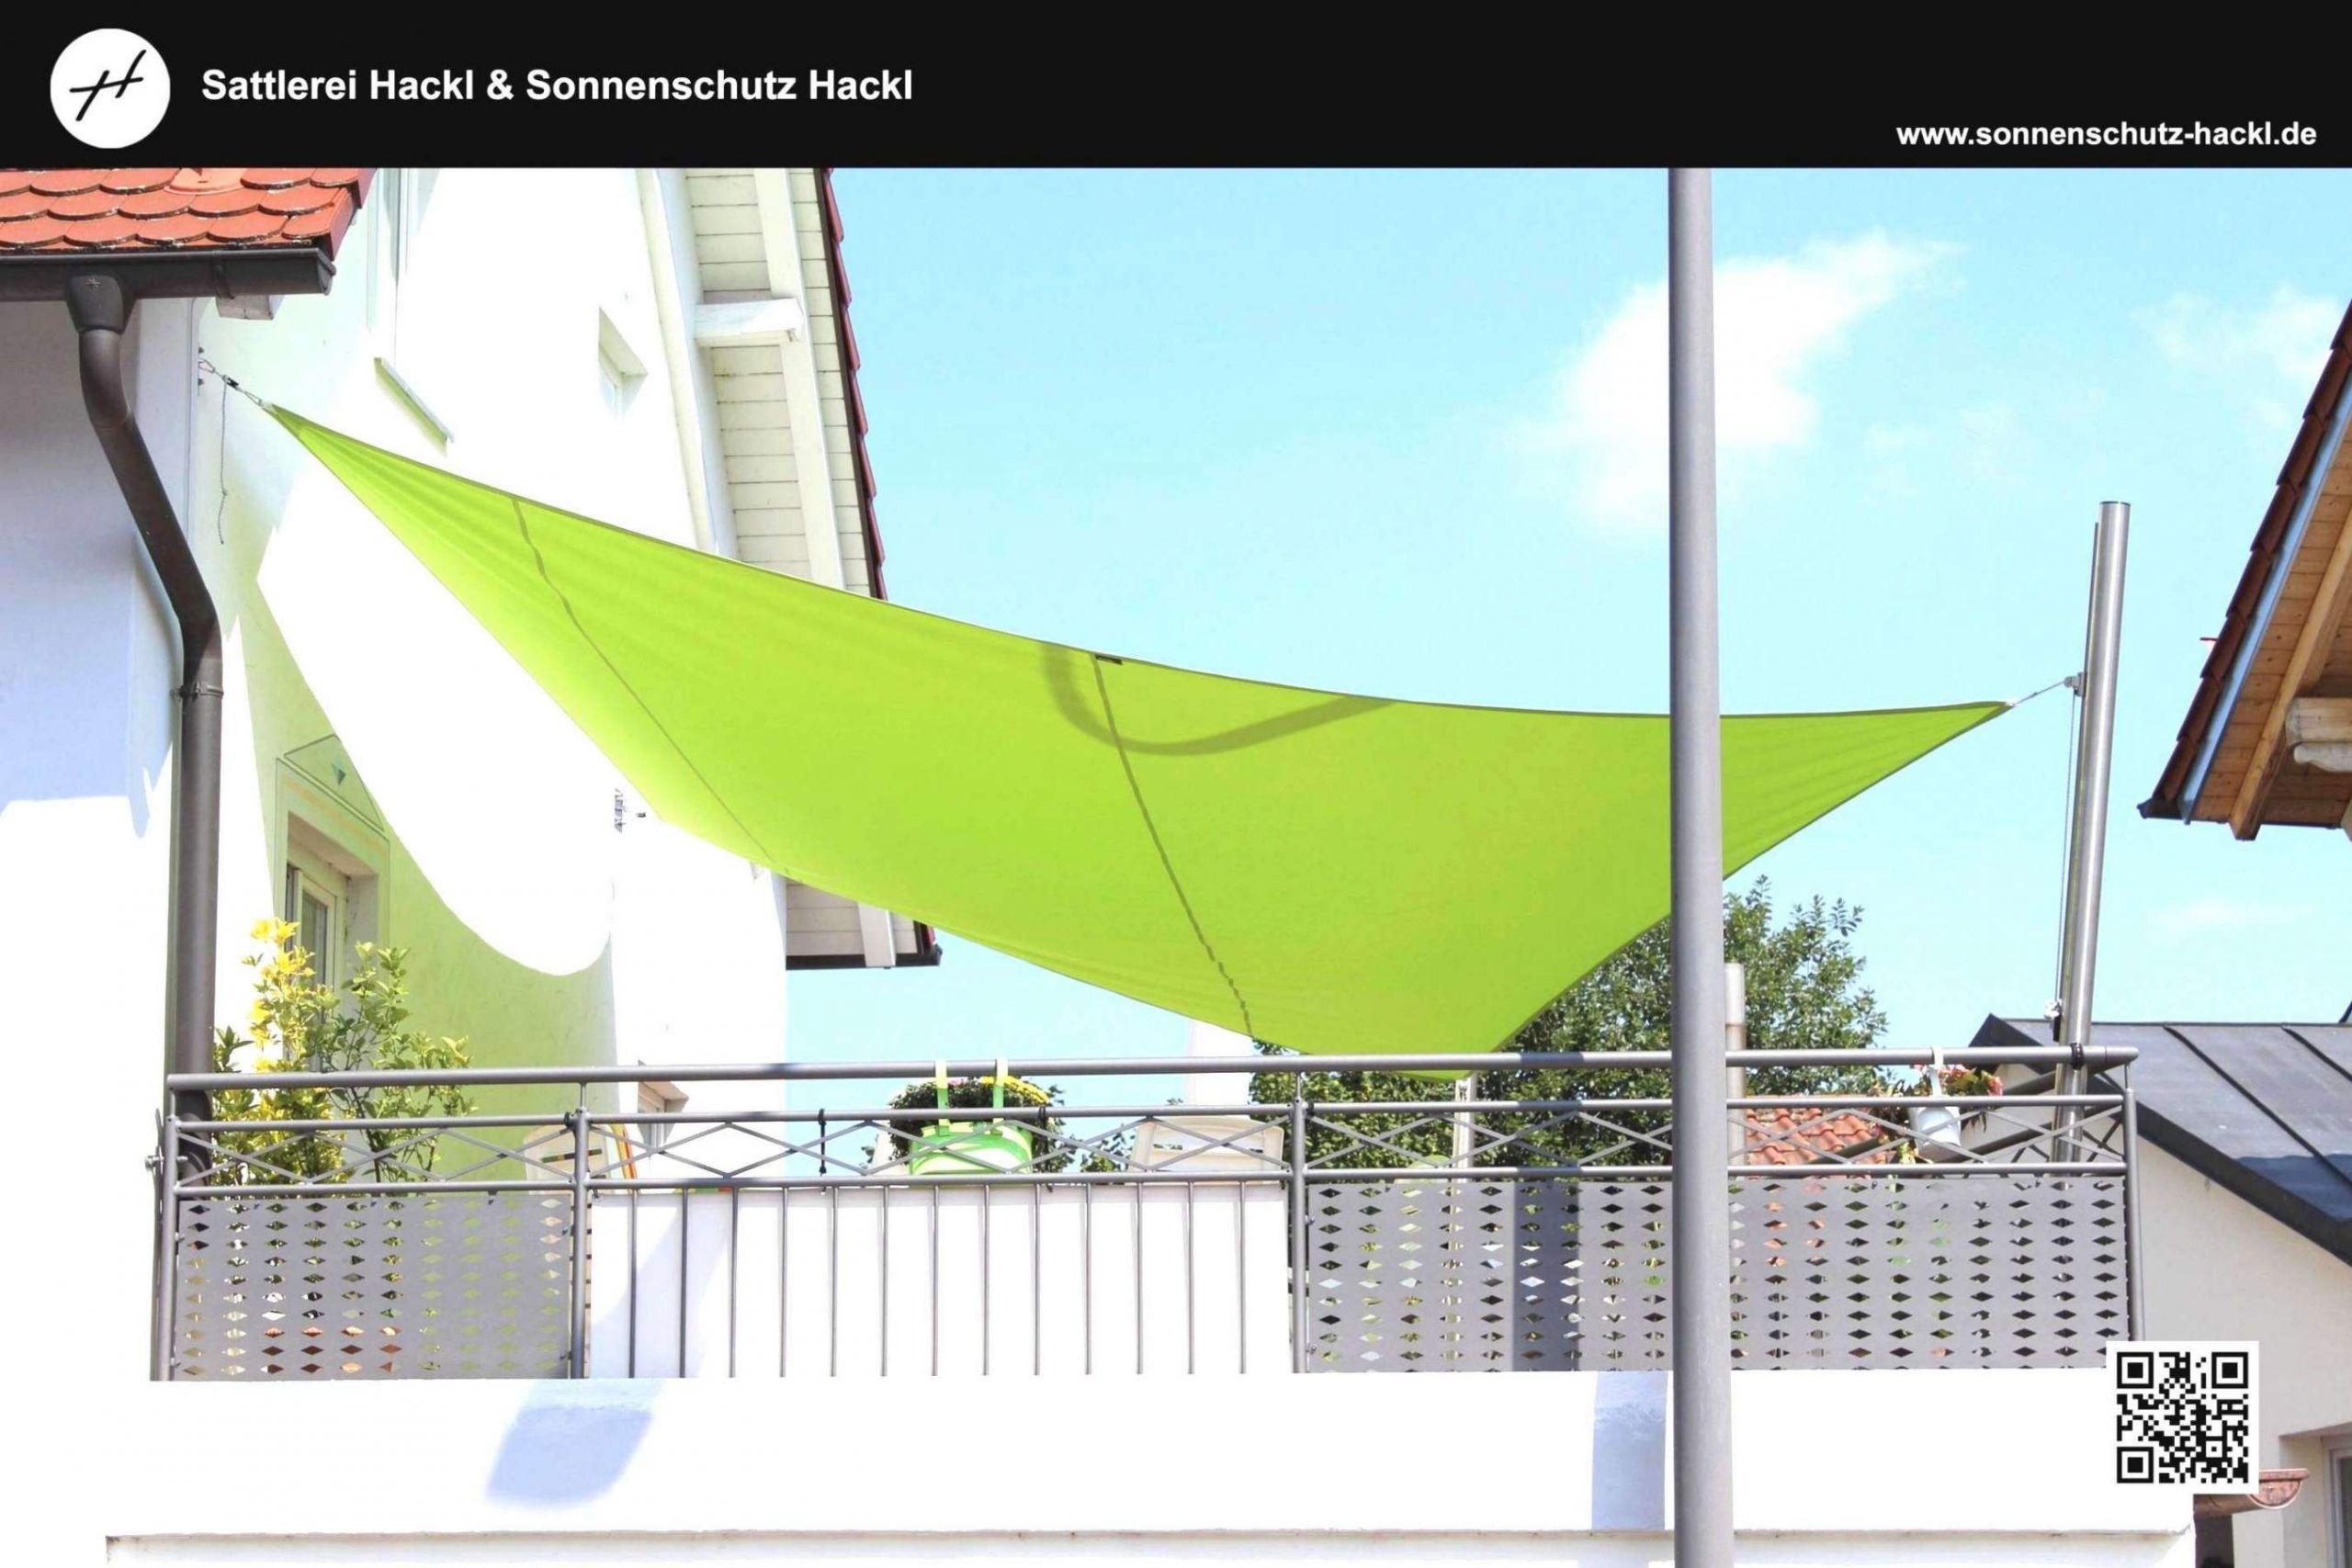 garten anlegen plan inspirierend jalousie gartenhaus im garten best sonnenschutz im garten sonnenschutz im garten